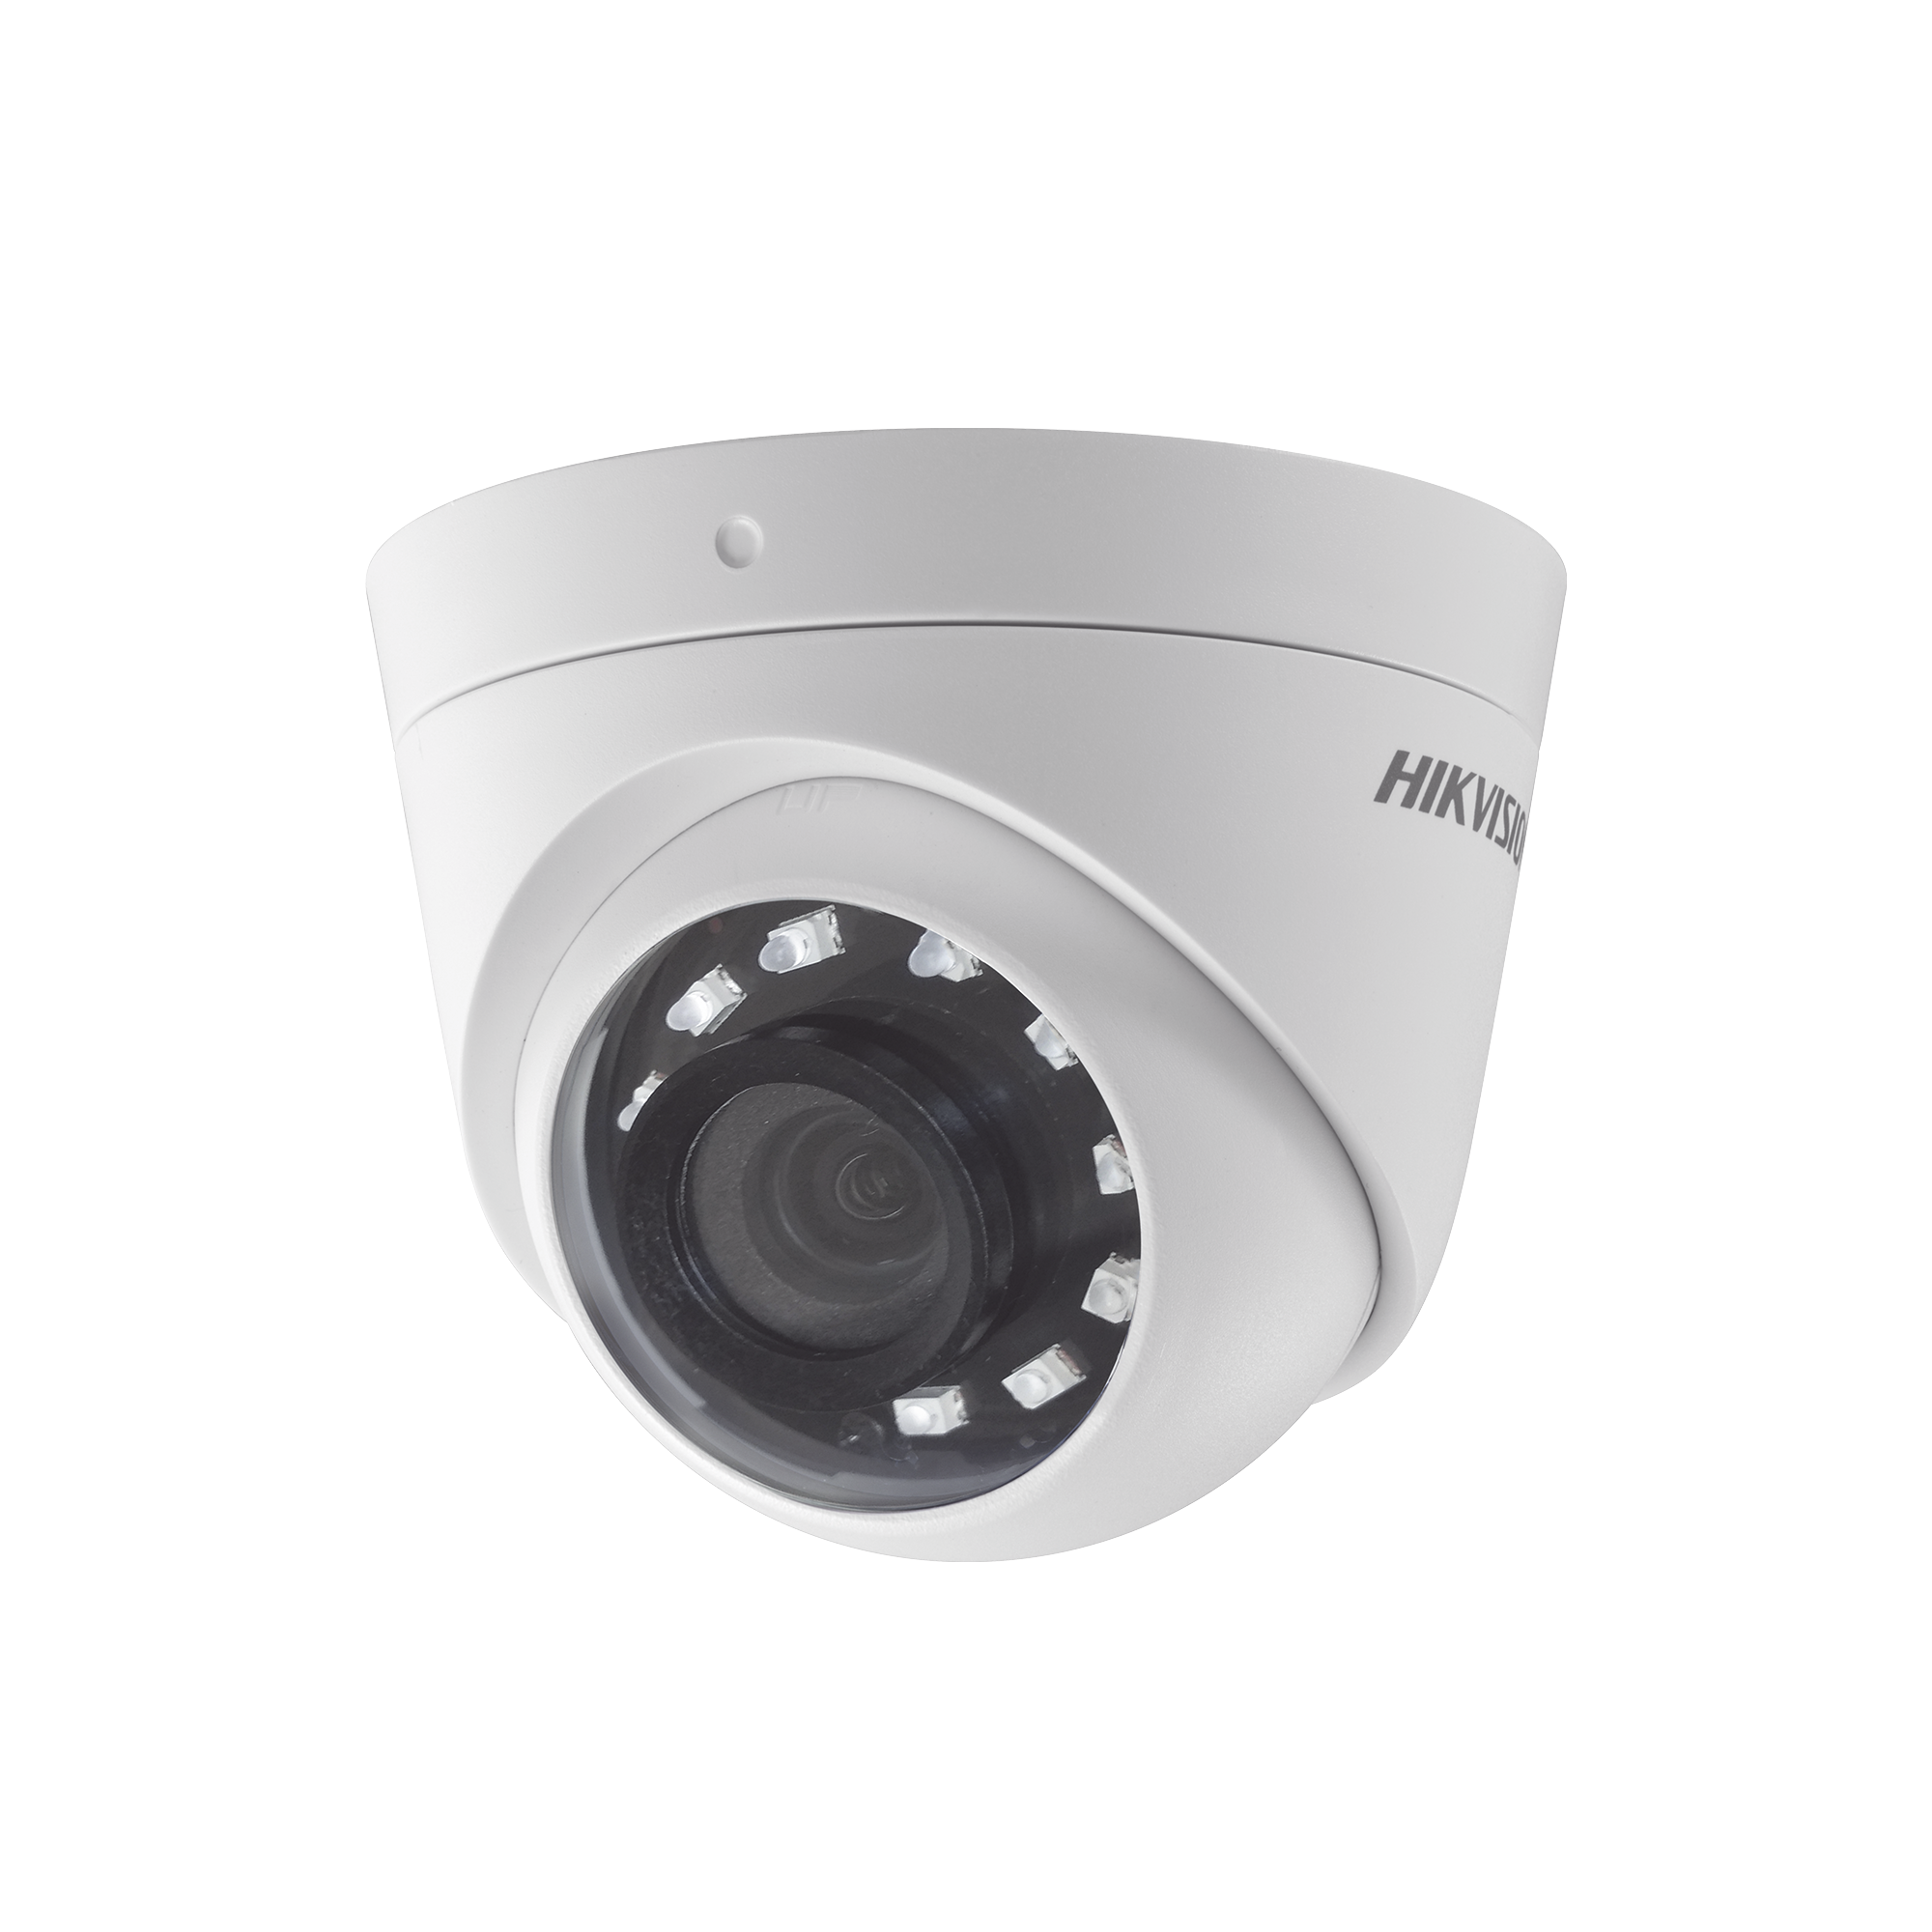 Domo TURBO 1080p / Gran Angular 106? / Lente 2.8 mm / 20 mts Smart IR / Exterior IP66 / 4 Tecnologías (TVI / AHD / CVI / CVBS)